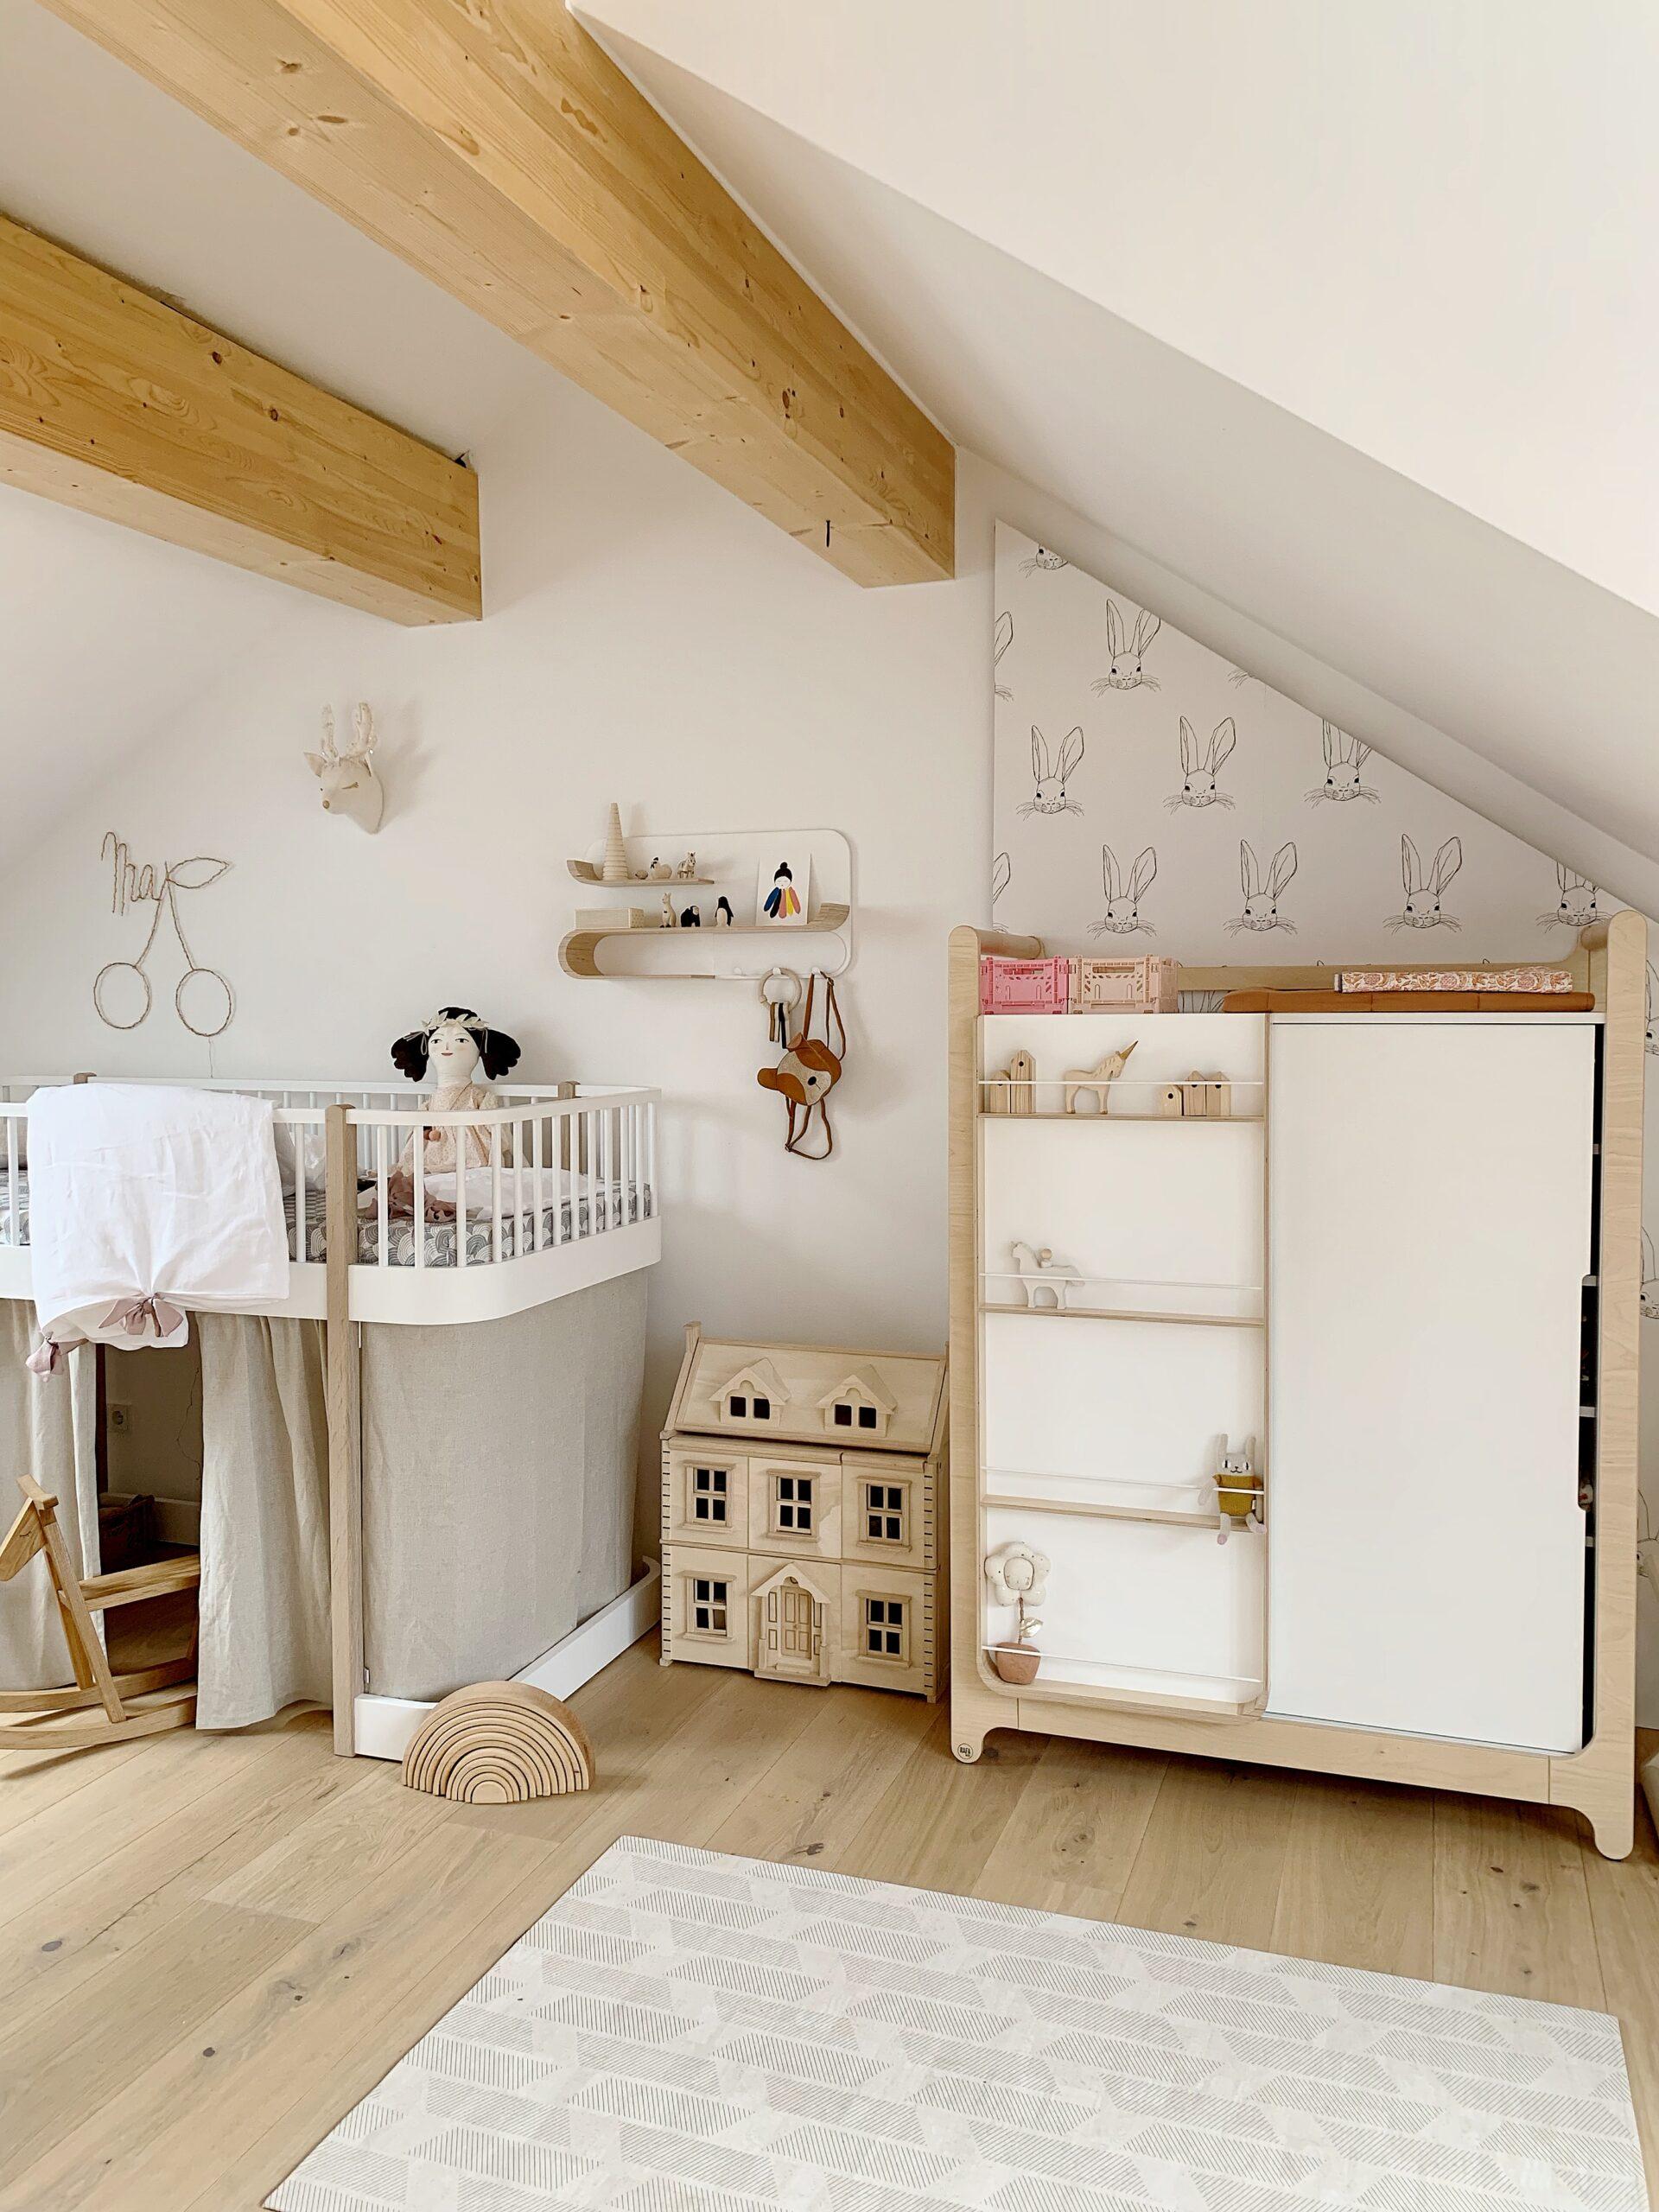 Full Size of Sprossenwand Kinderzimmer Regal Weiß Regale Sofa Kinderzimmer Sprossenwand Kinderzimmer